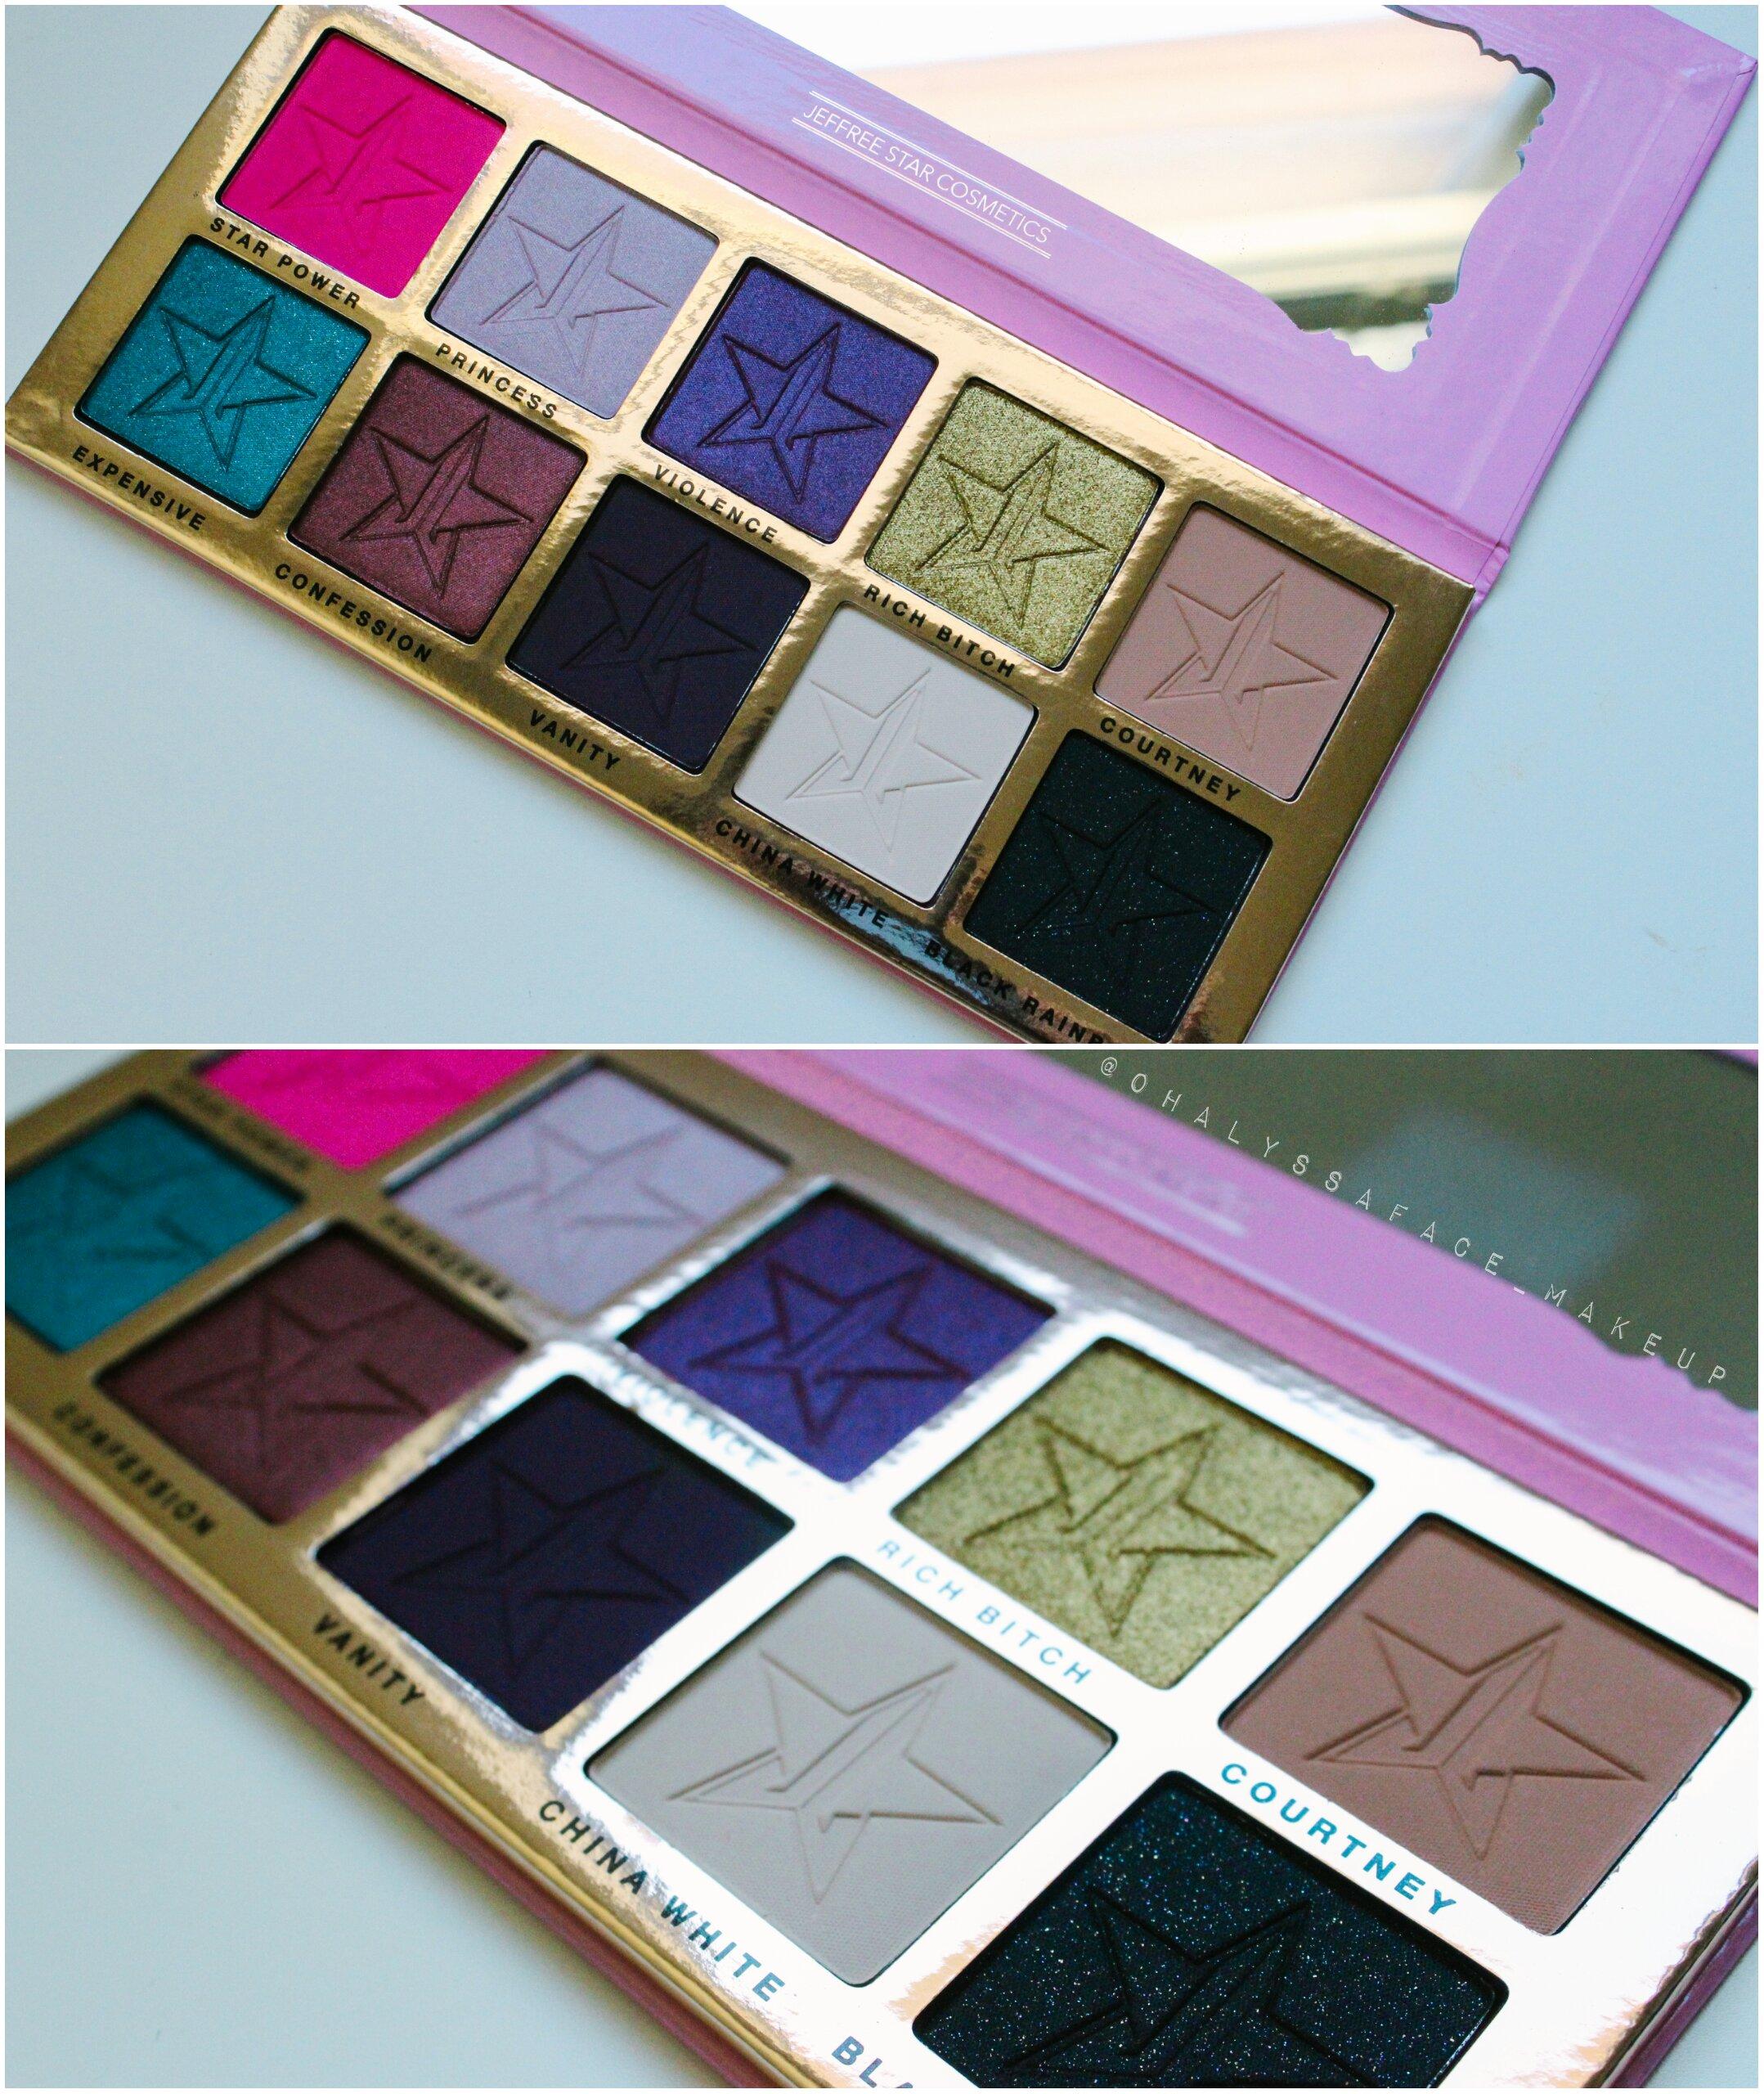 Beauty Killer Palette Jeffree Star Cosmetics Vegan Makeup Cruelty-Free Makeup Rich Bitch Jeffree Star Makeup Swatches